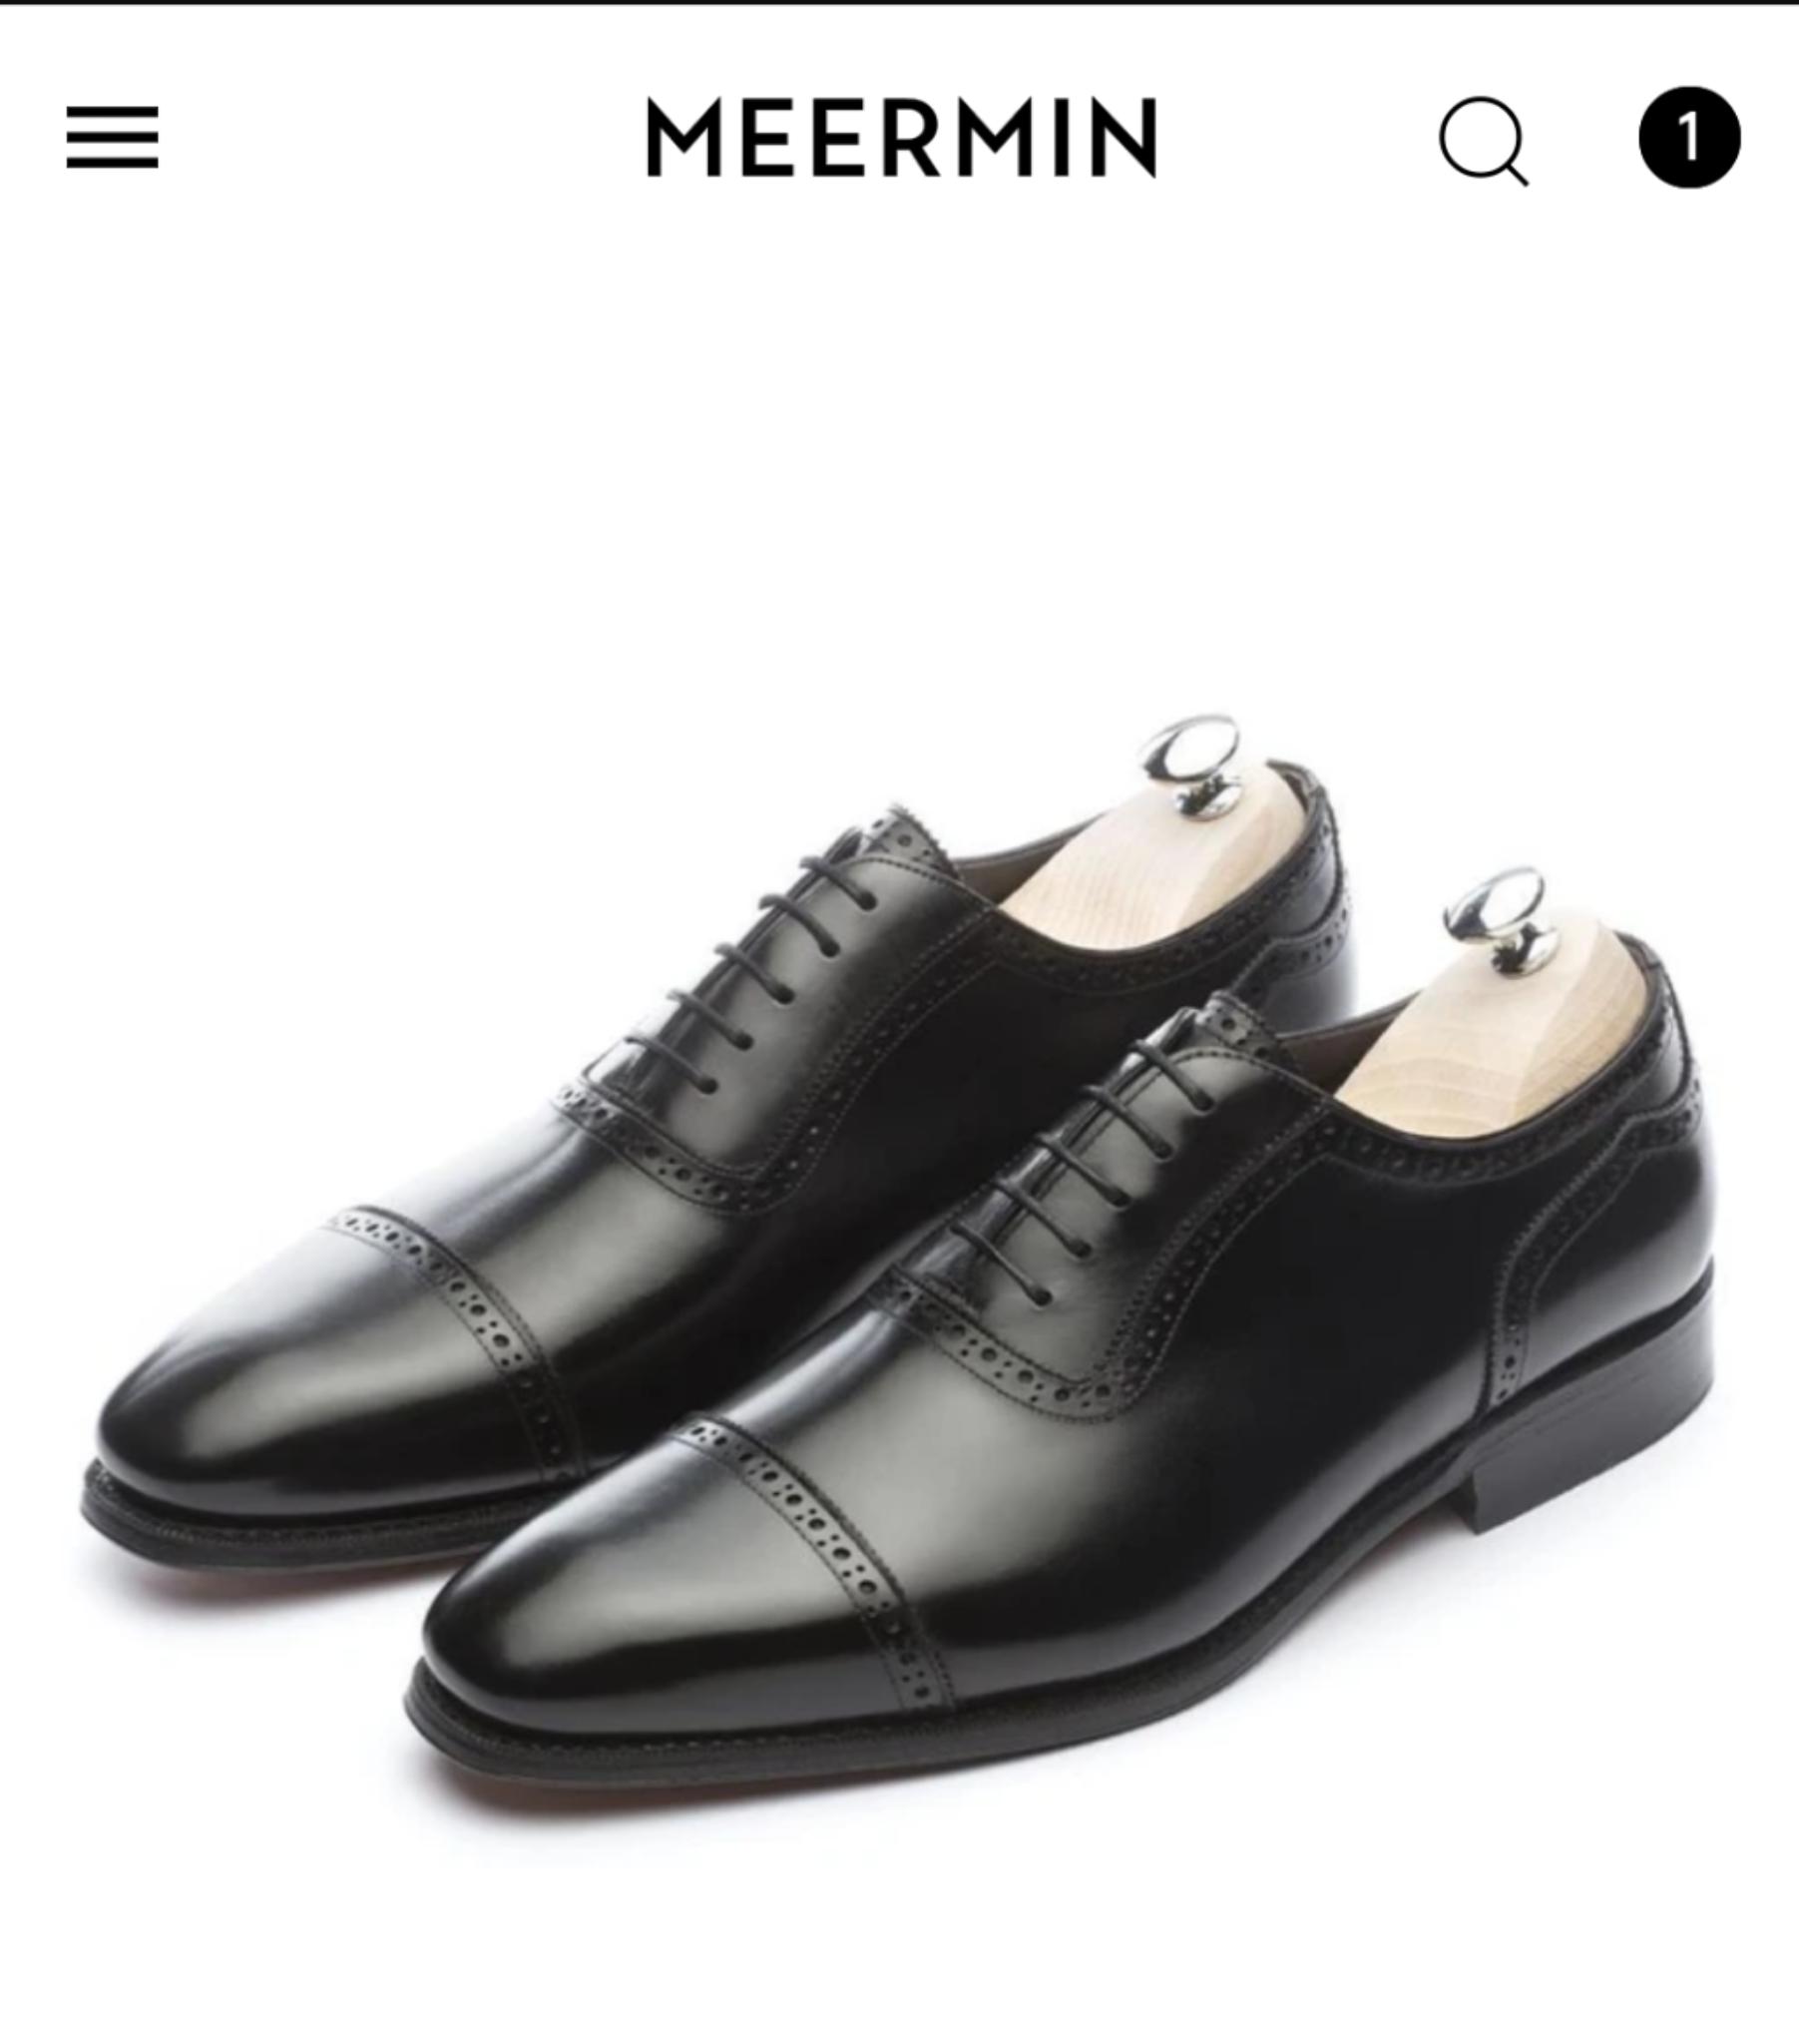 Meermin Schuhe Summer Sale -25%